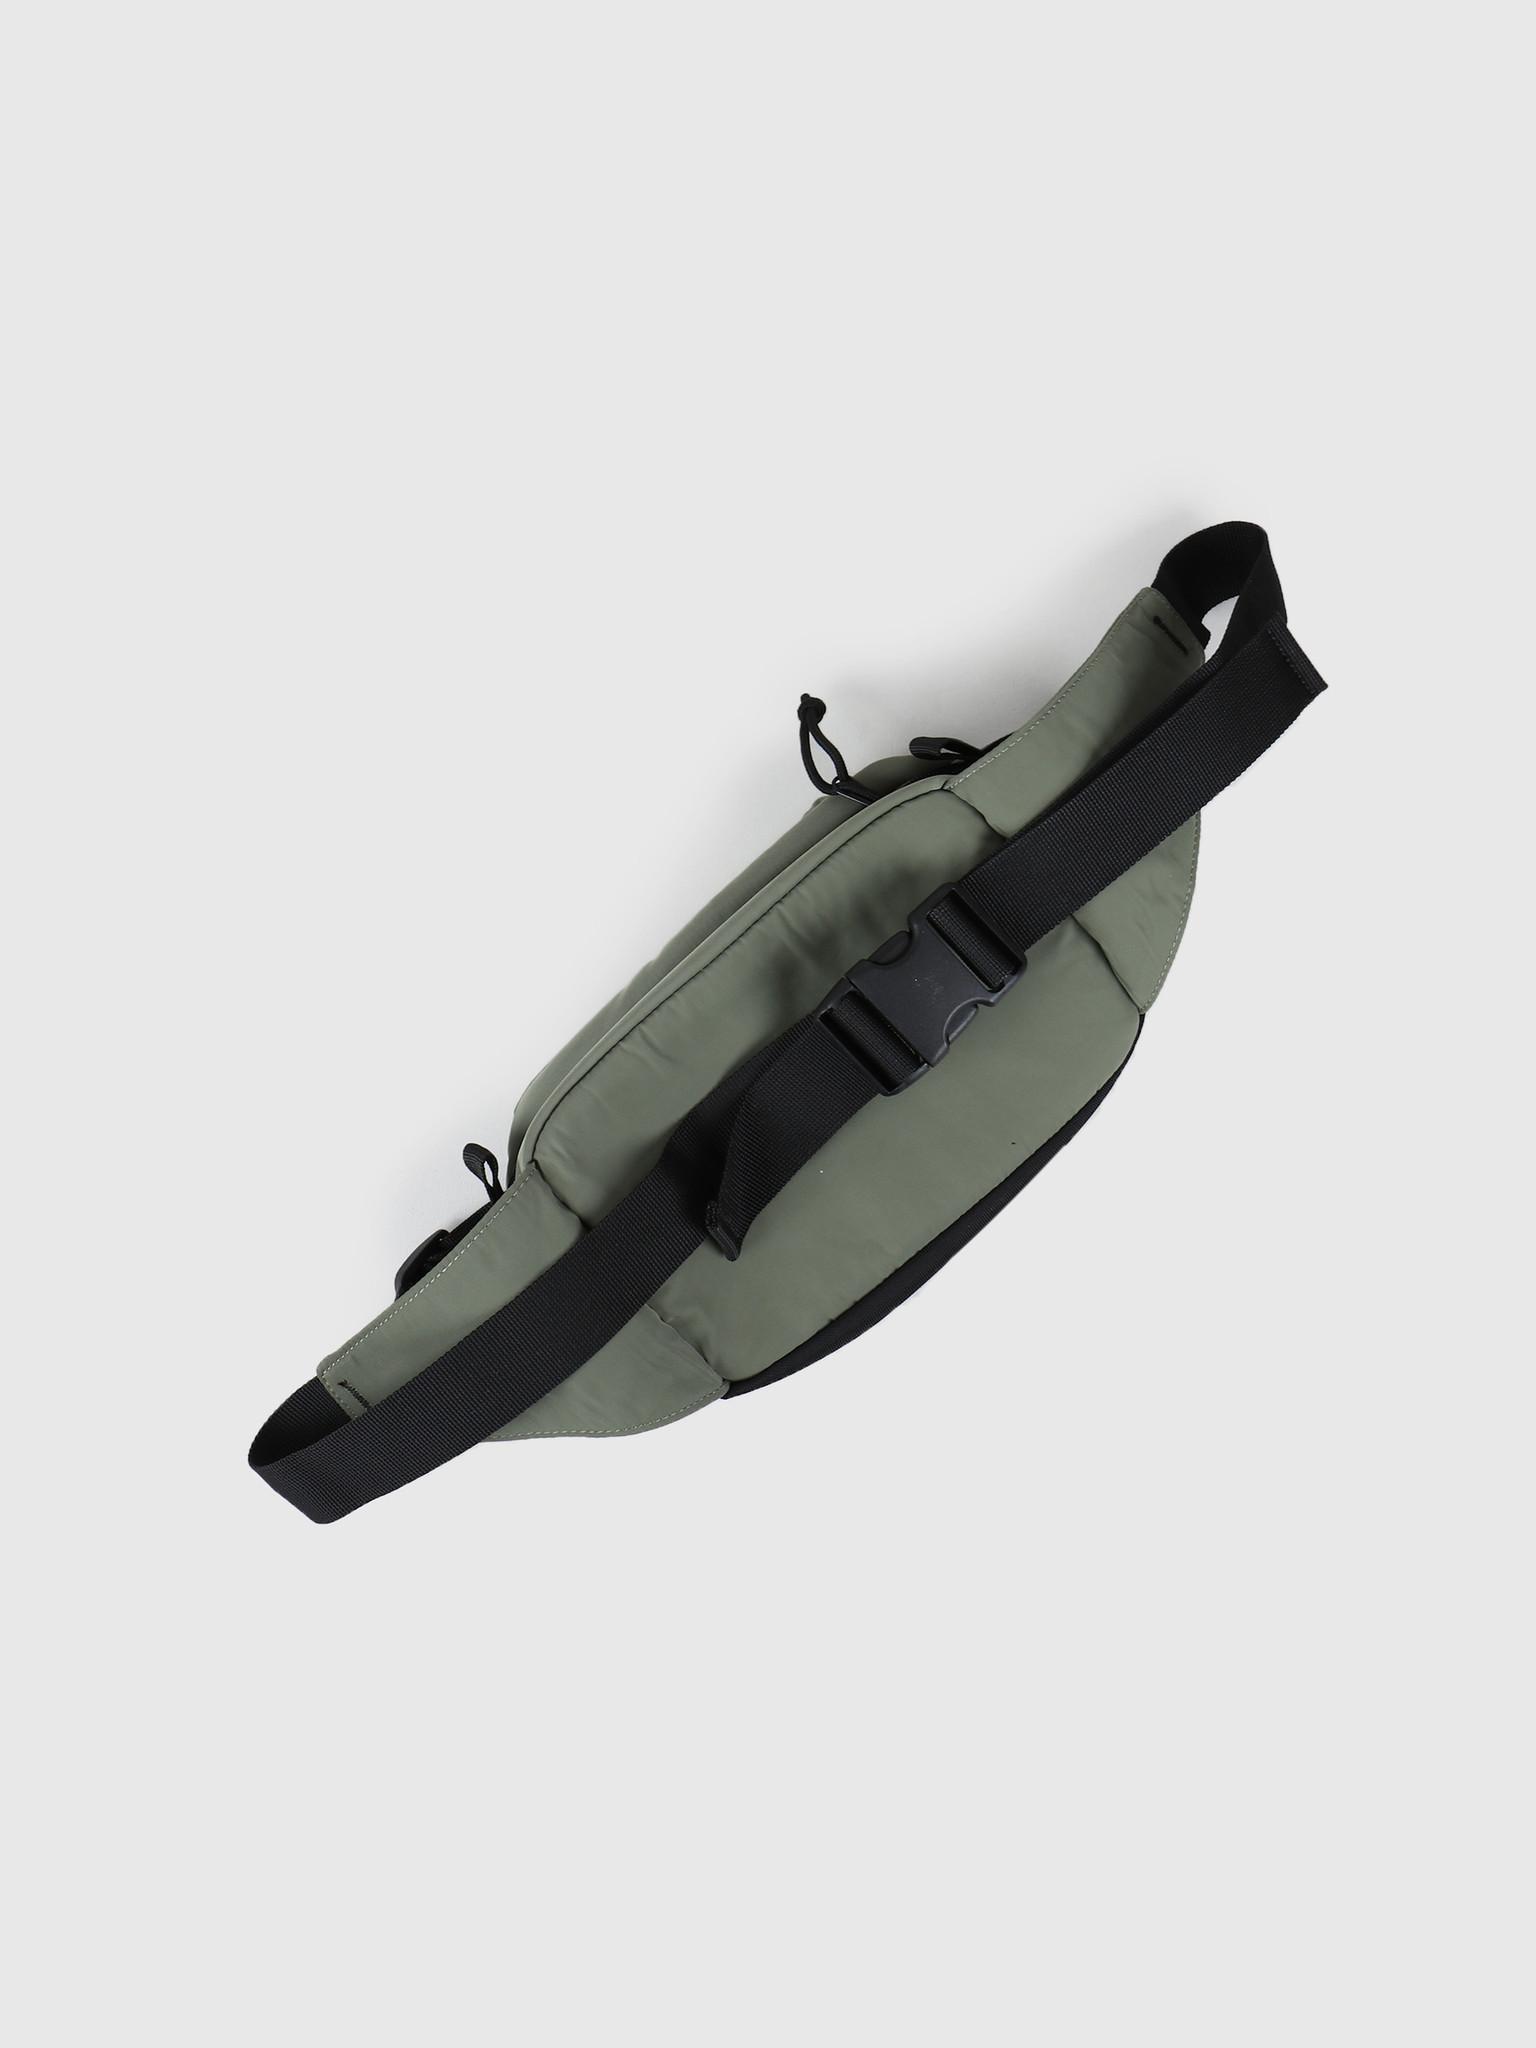 Carhartt WIP Carhartt WIP Military Hip Bag Dollar Green Black I024252-66790